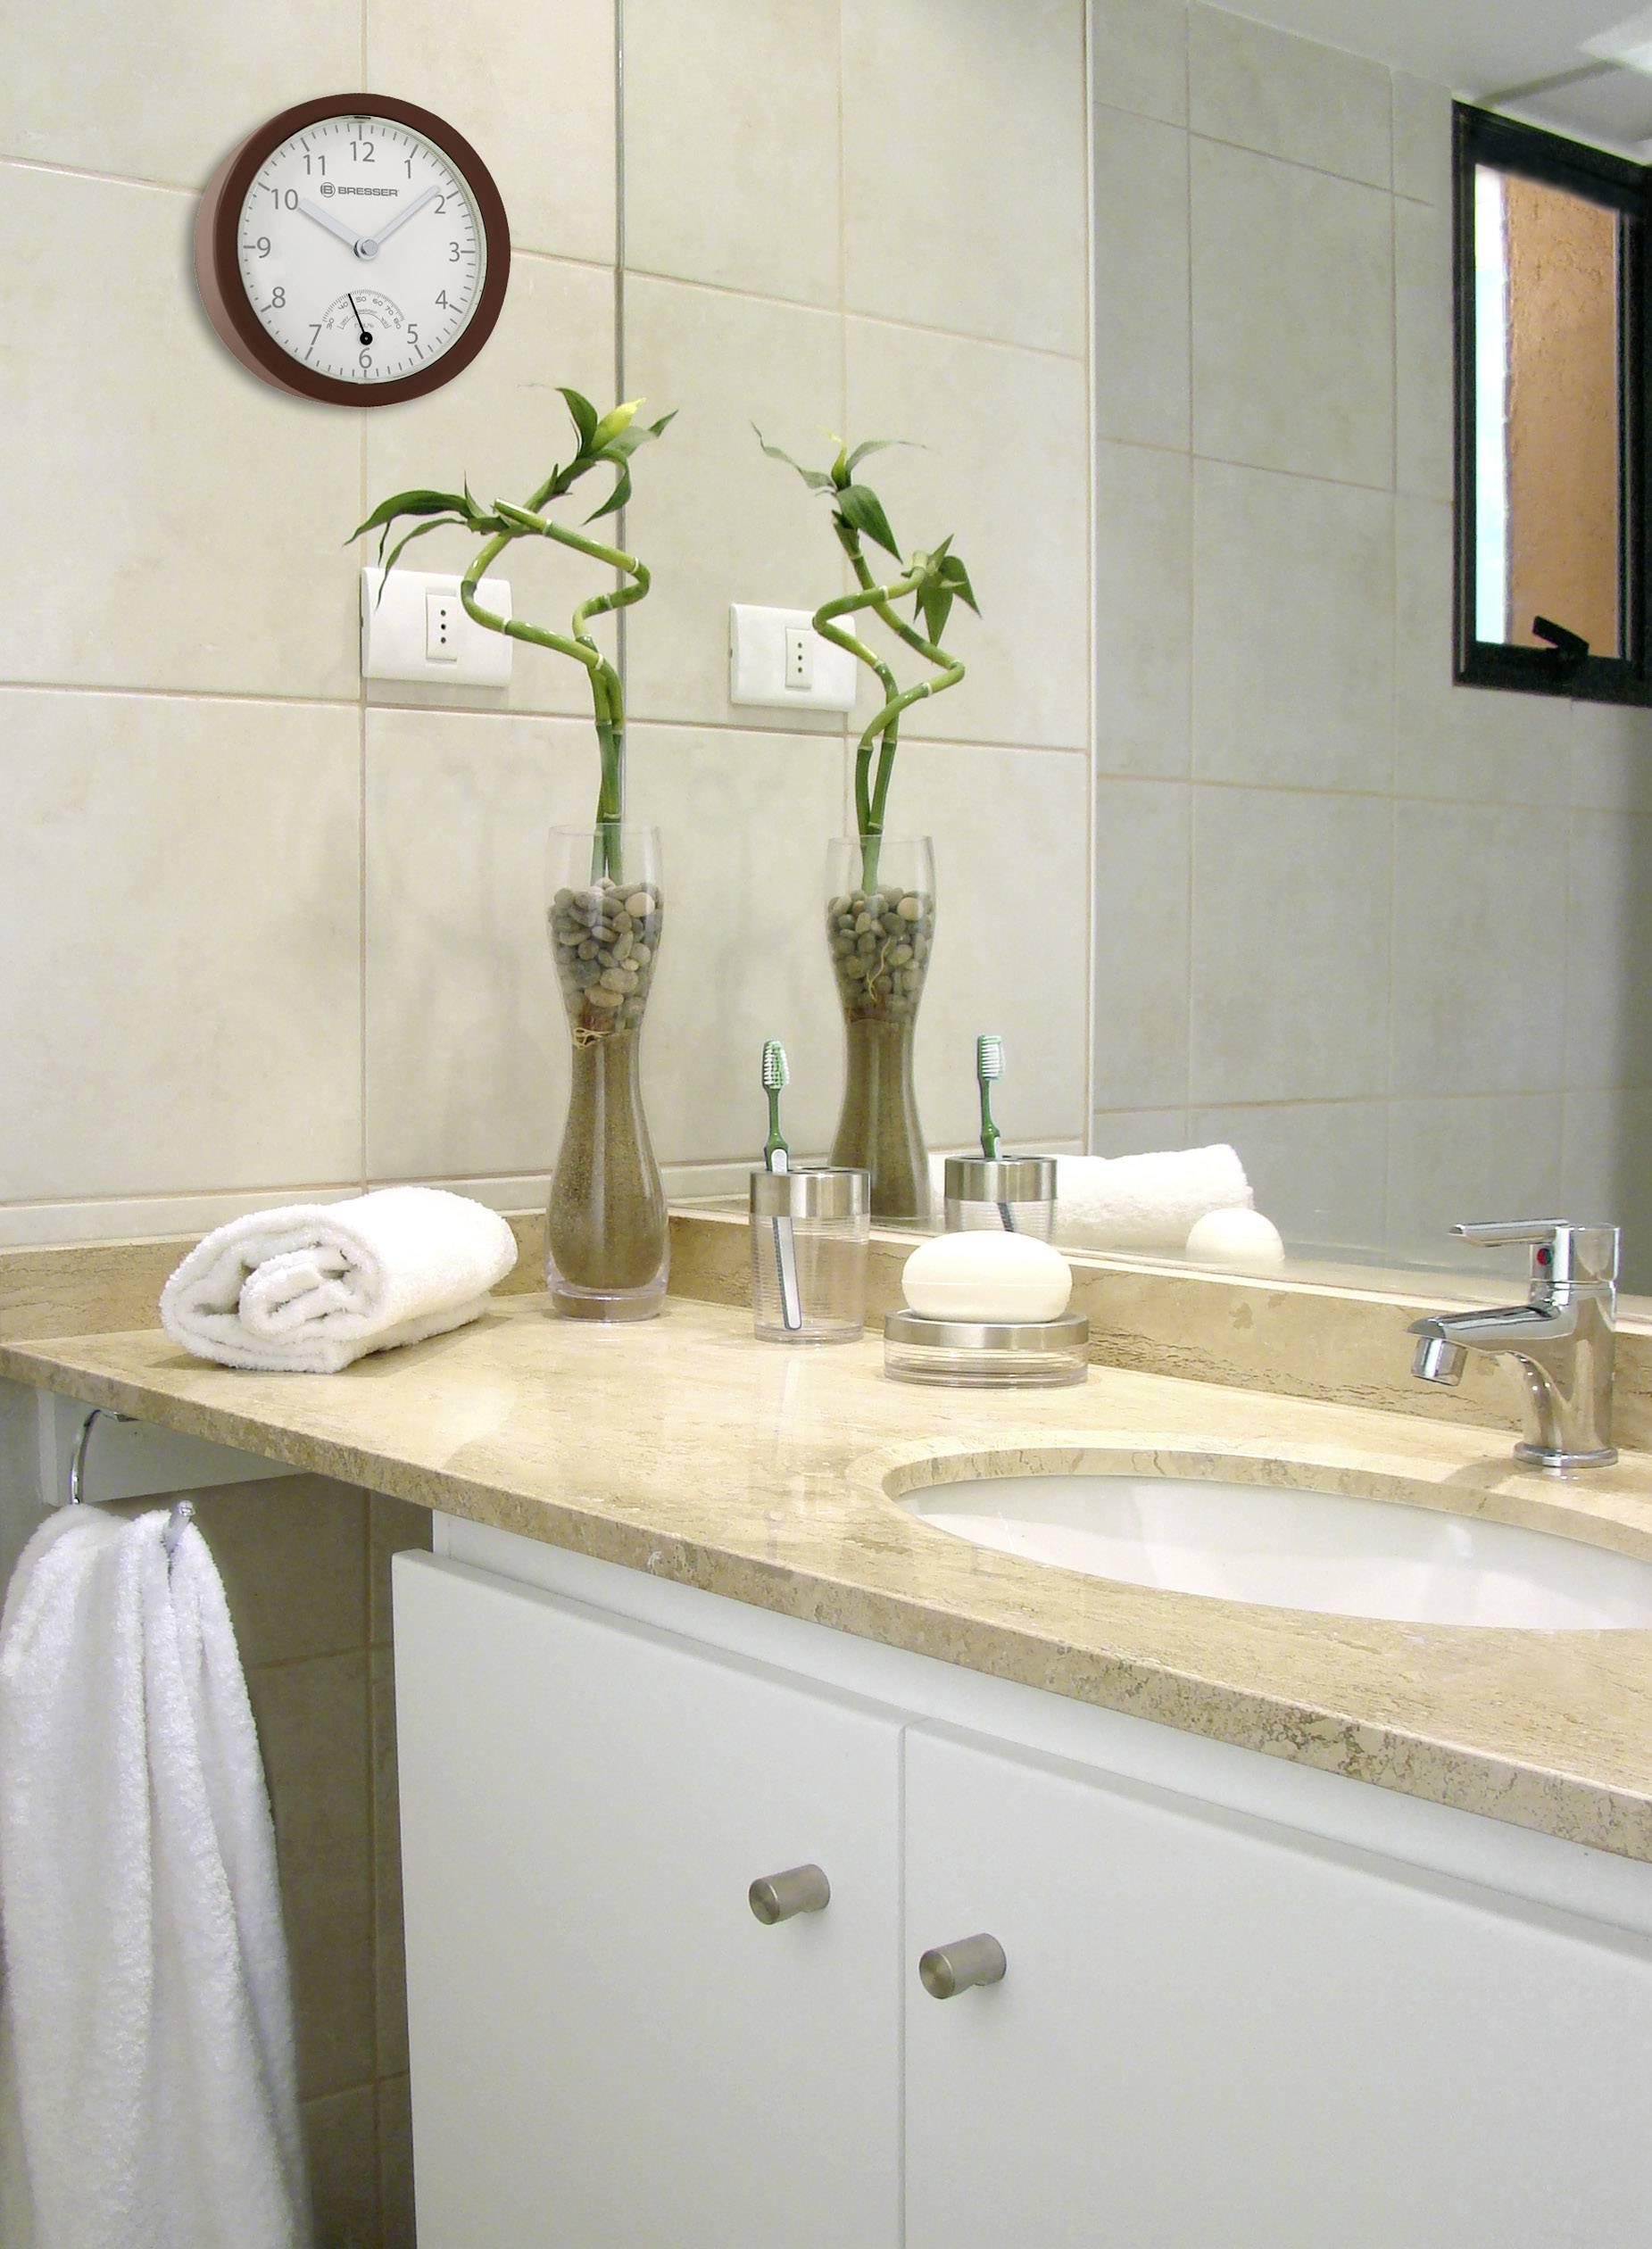 wanduhr badezimmer uhr lautlos kklock wanduhr wanduhren fa r wohnzimmer ba ro fr bro. Black Bedroom Furniture Sets. Home Design Ideas